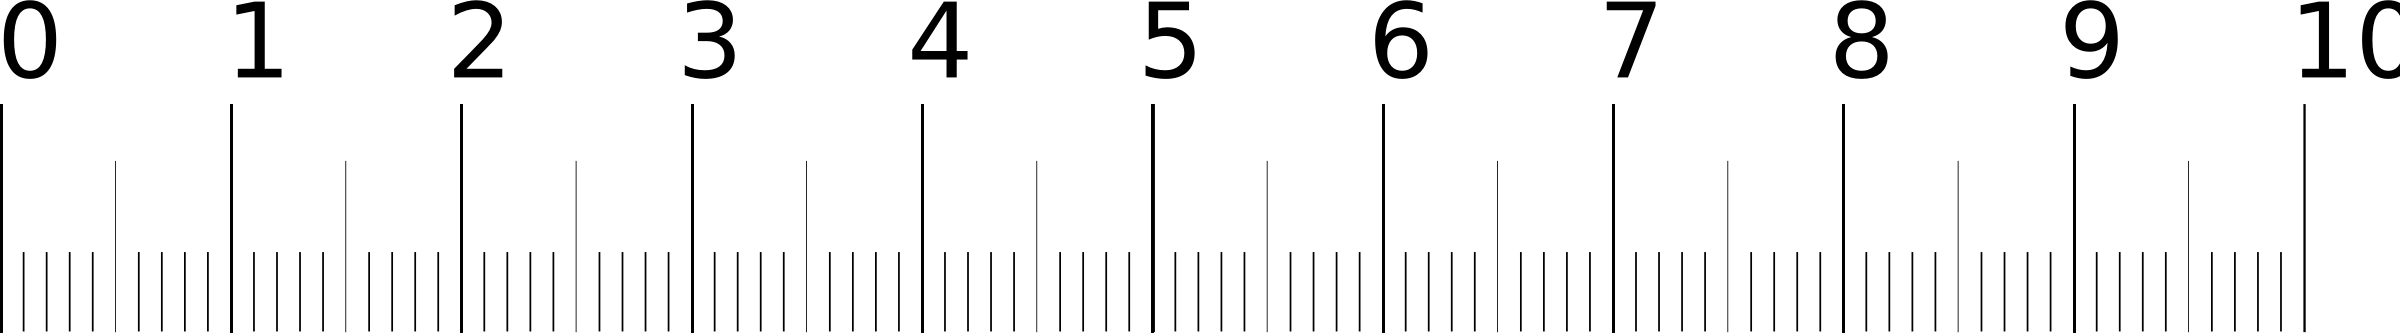 inch black and. Clipart ruler short ruler